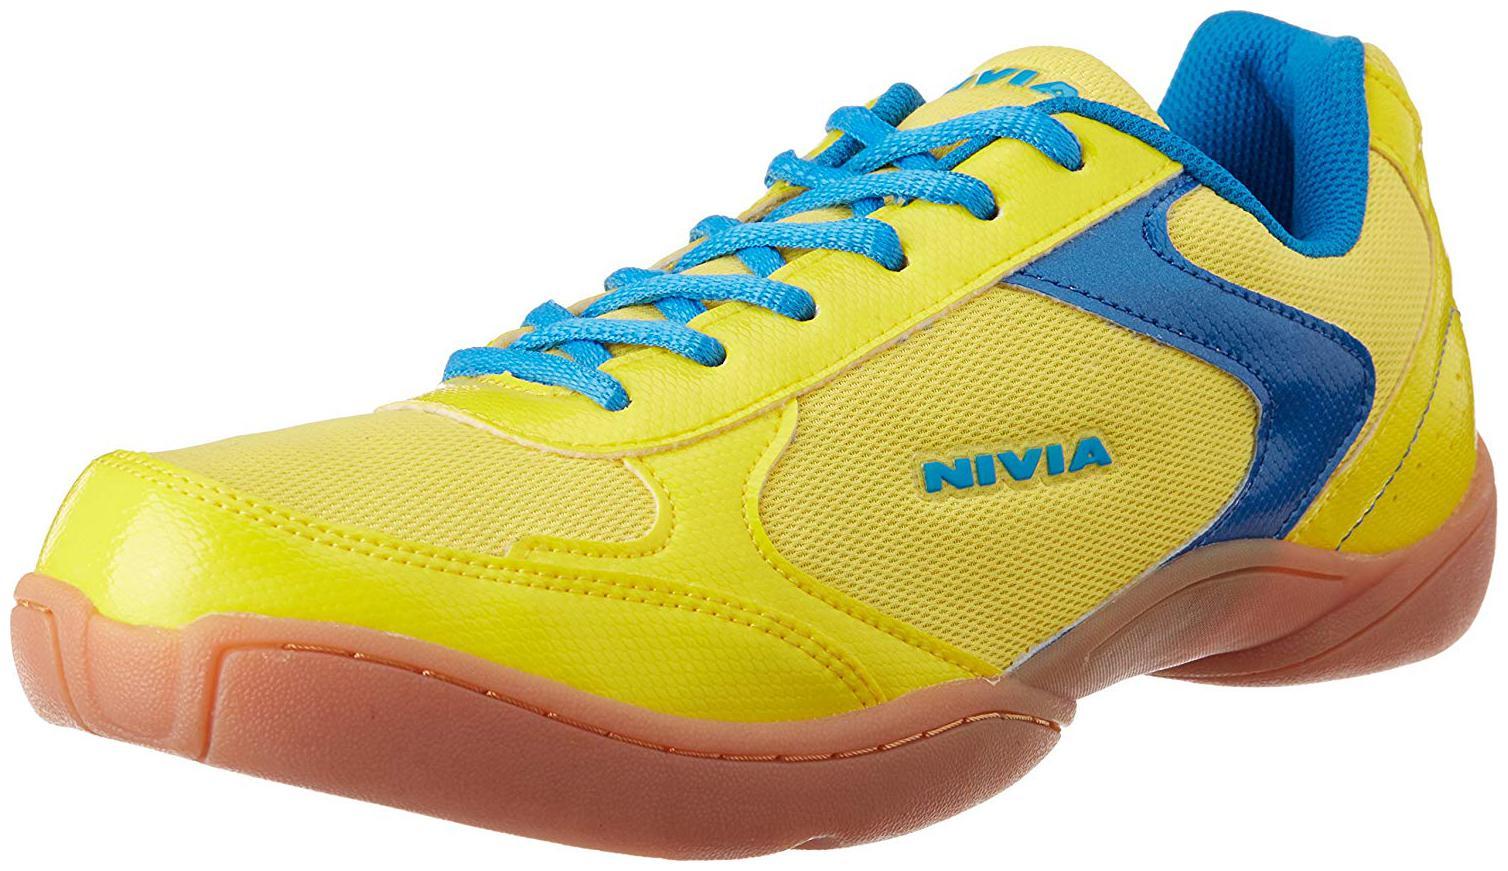 Nivia Men Non Marking Badminton/Squash Shoes  Yellow